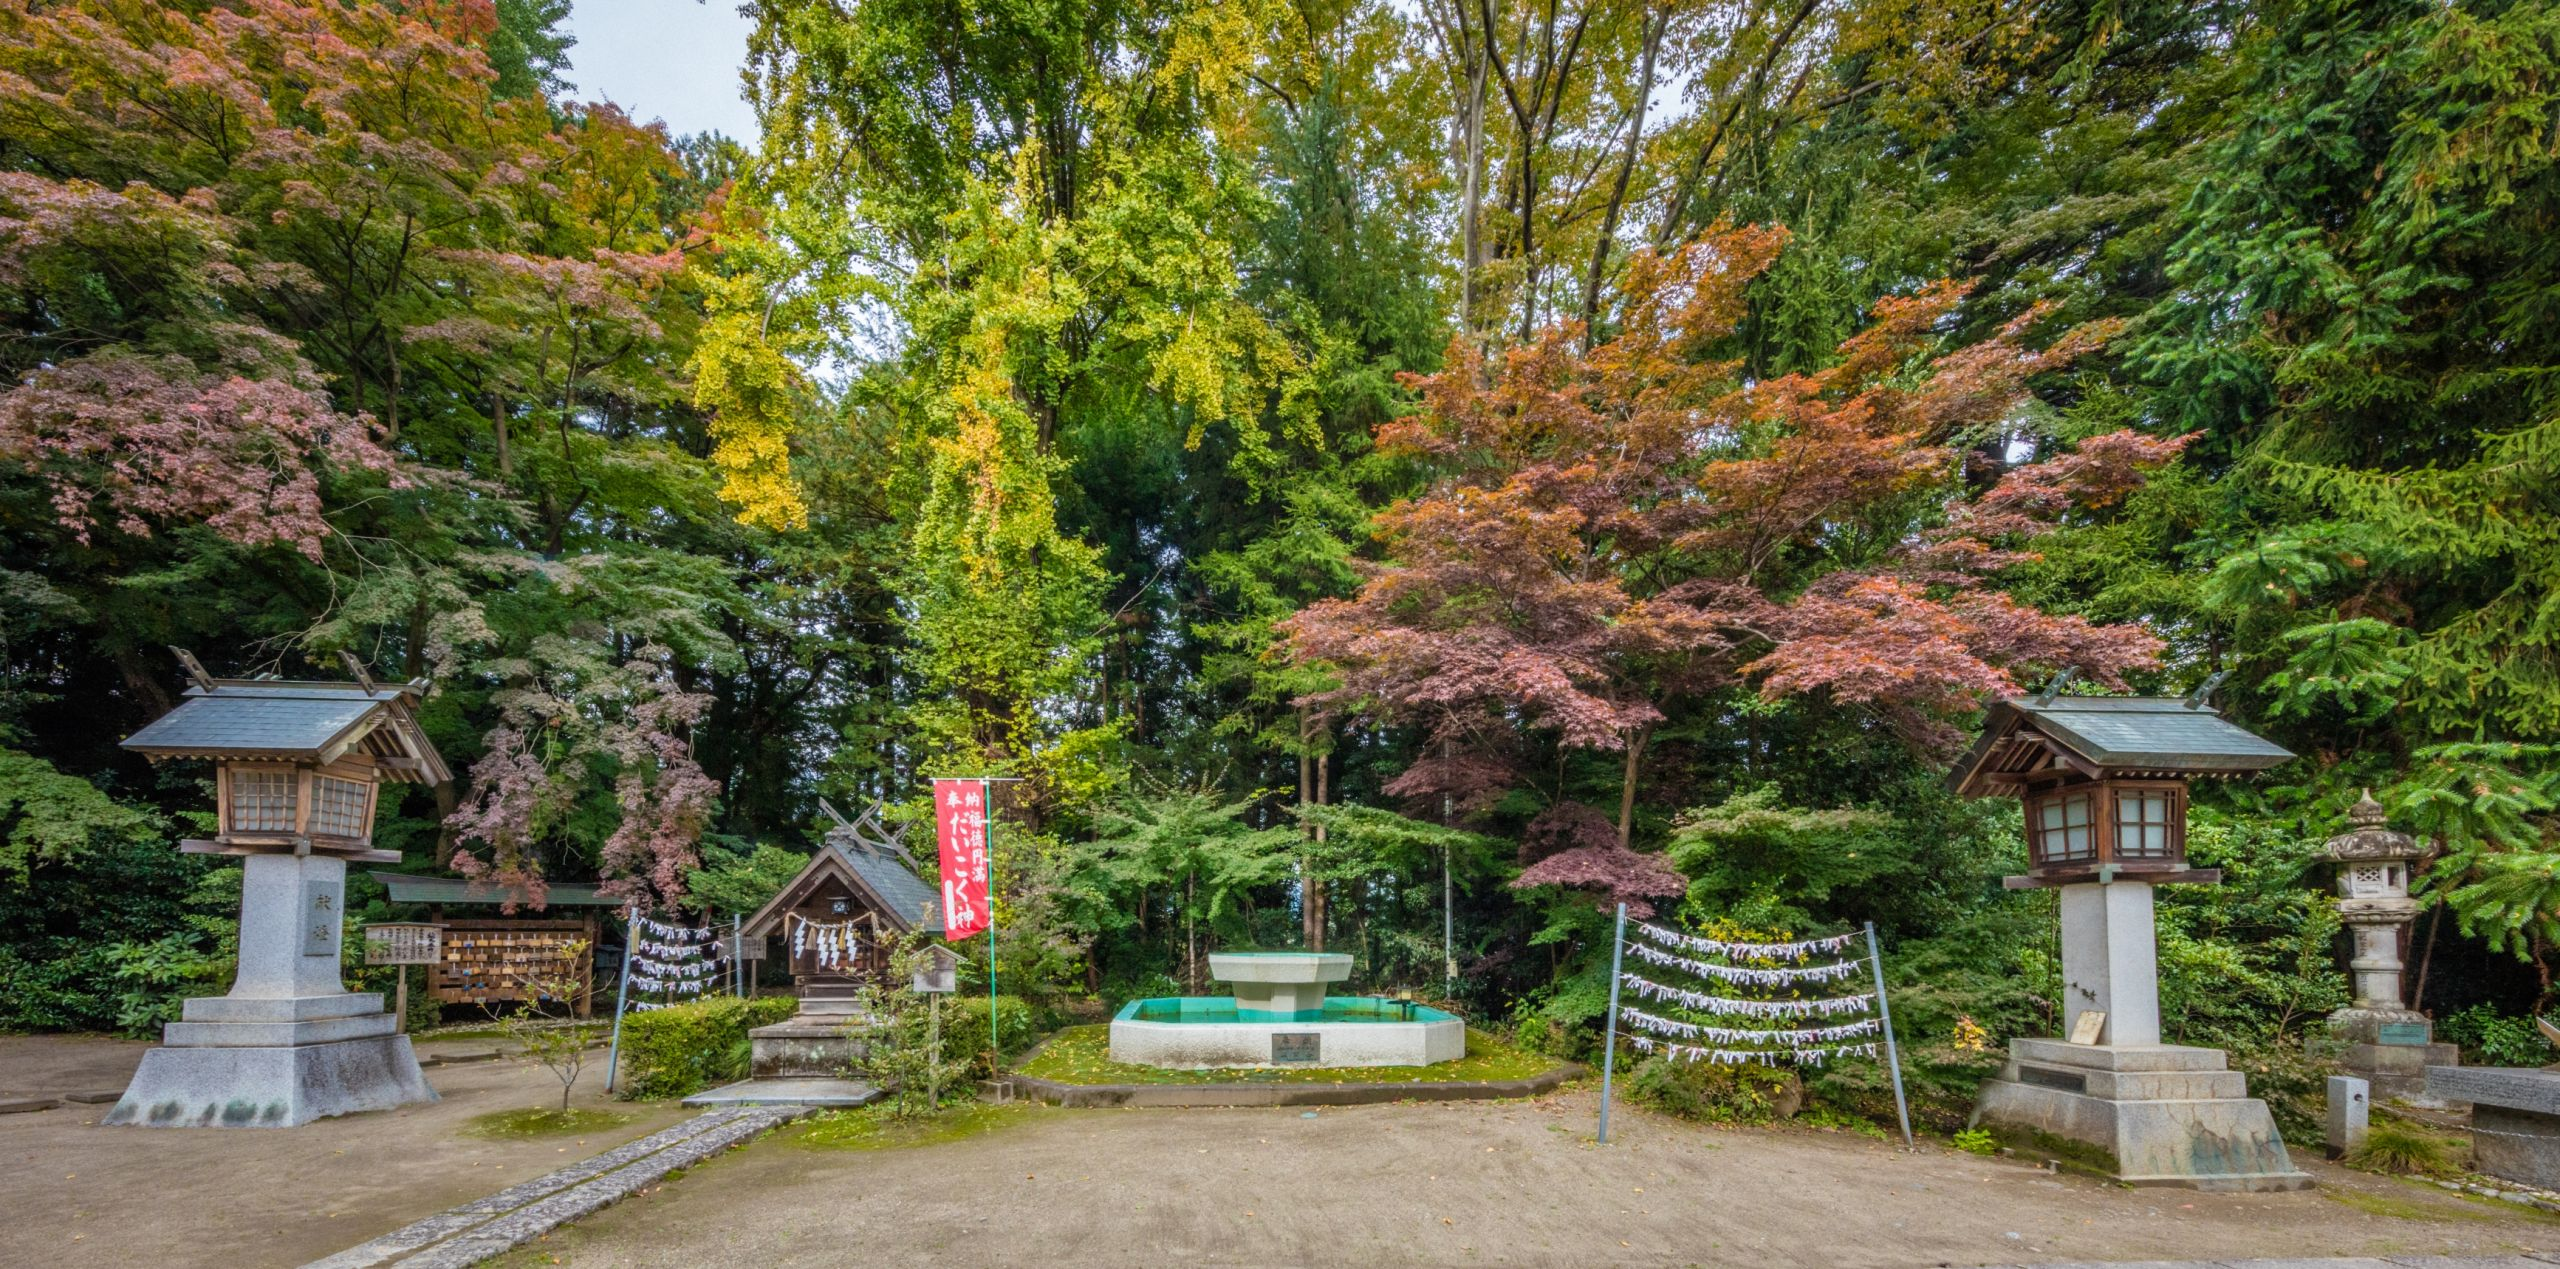 Shinmeisha Shrine